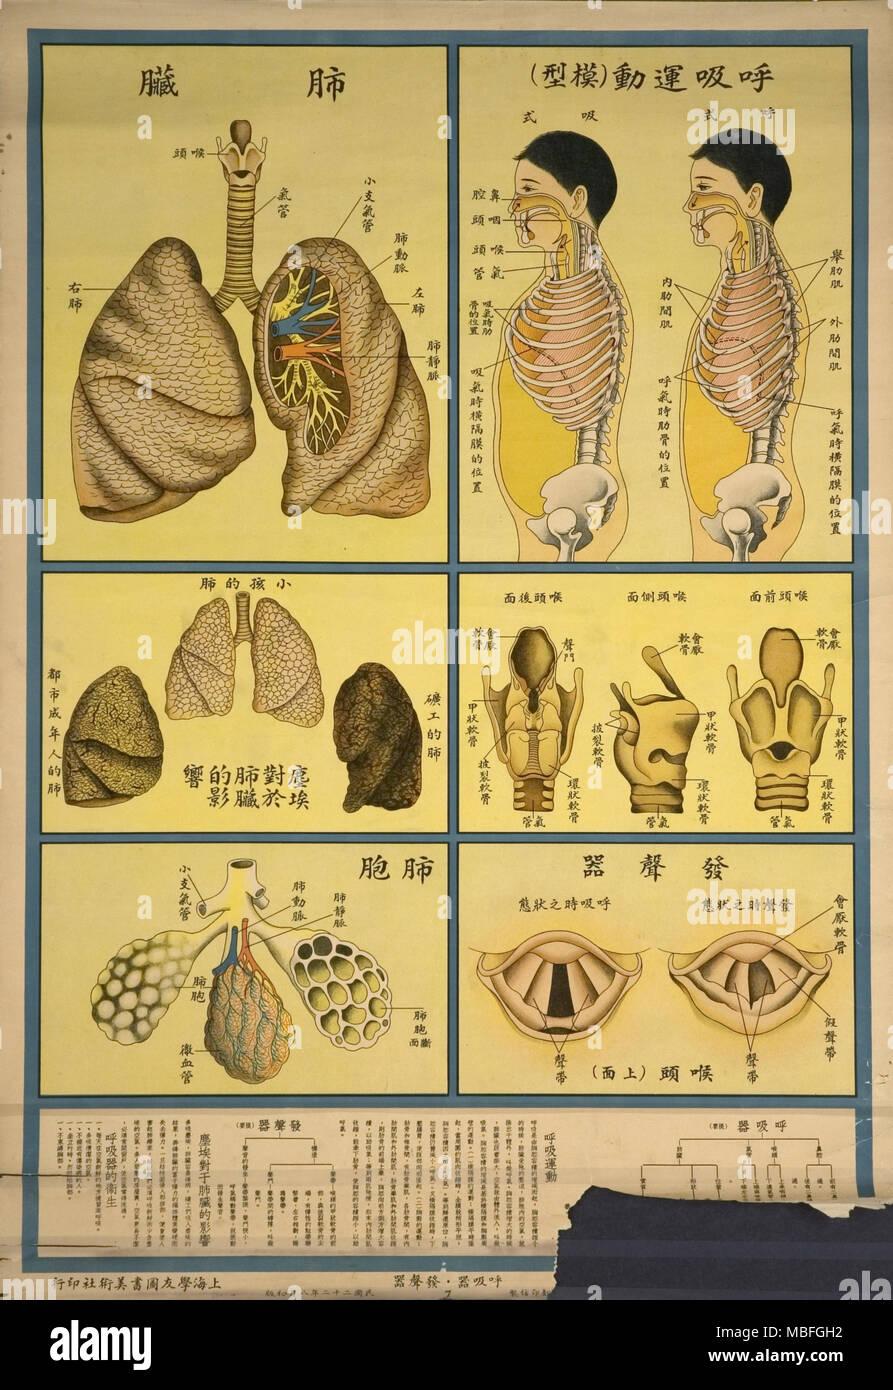 Lung Anatomy & Respiration - Stock Image